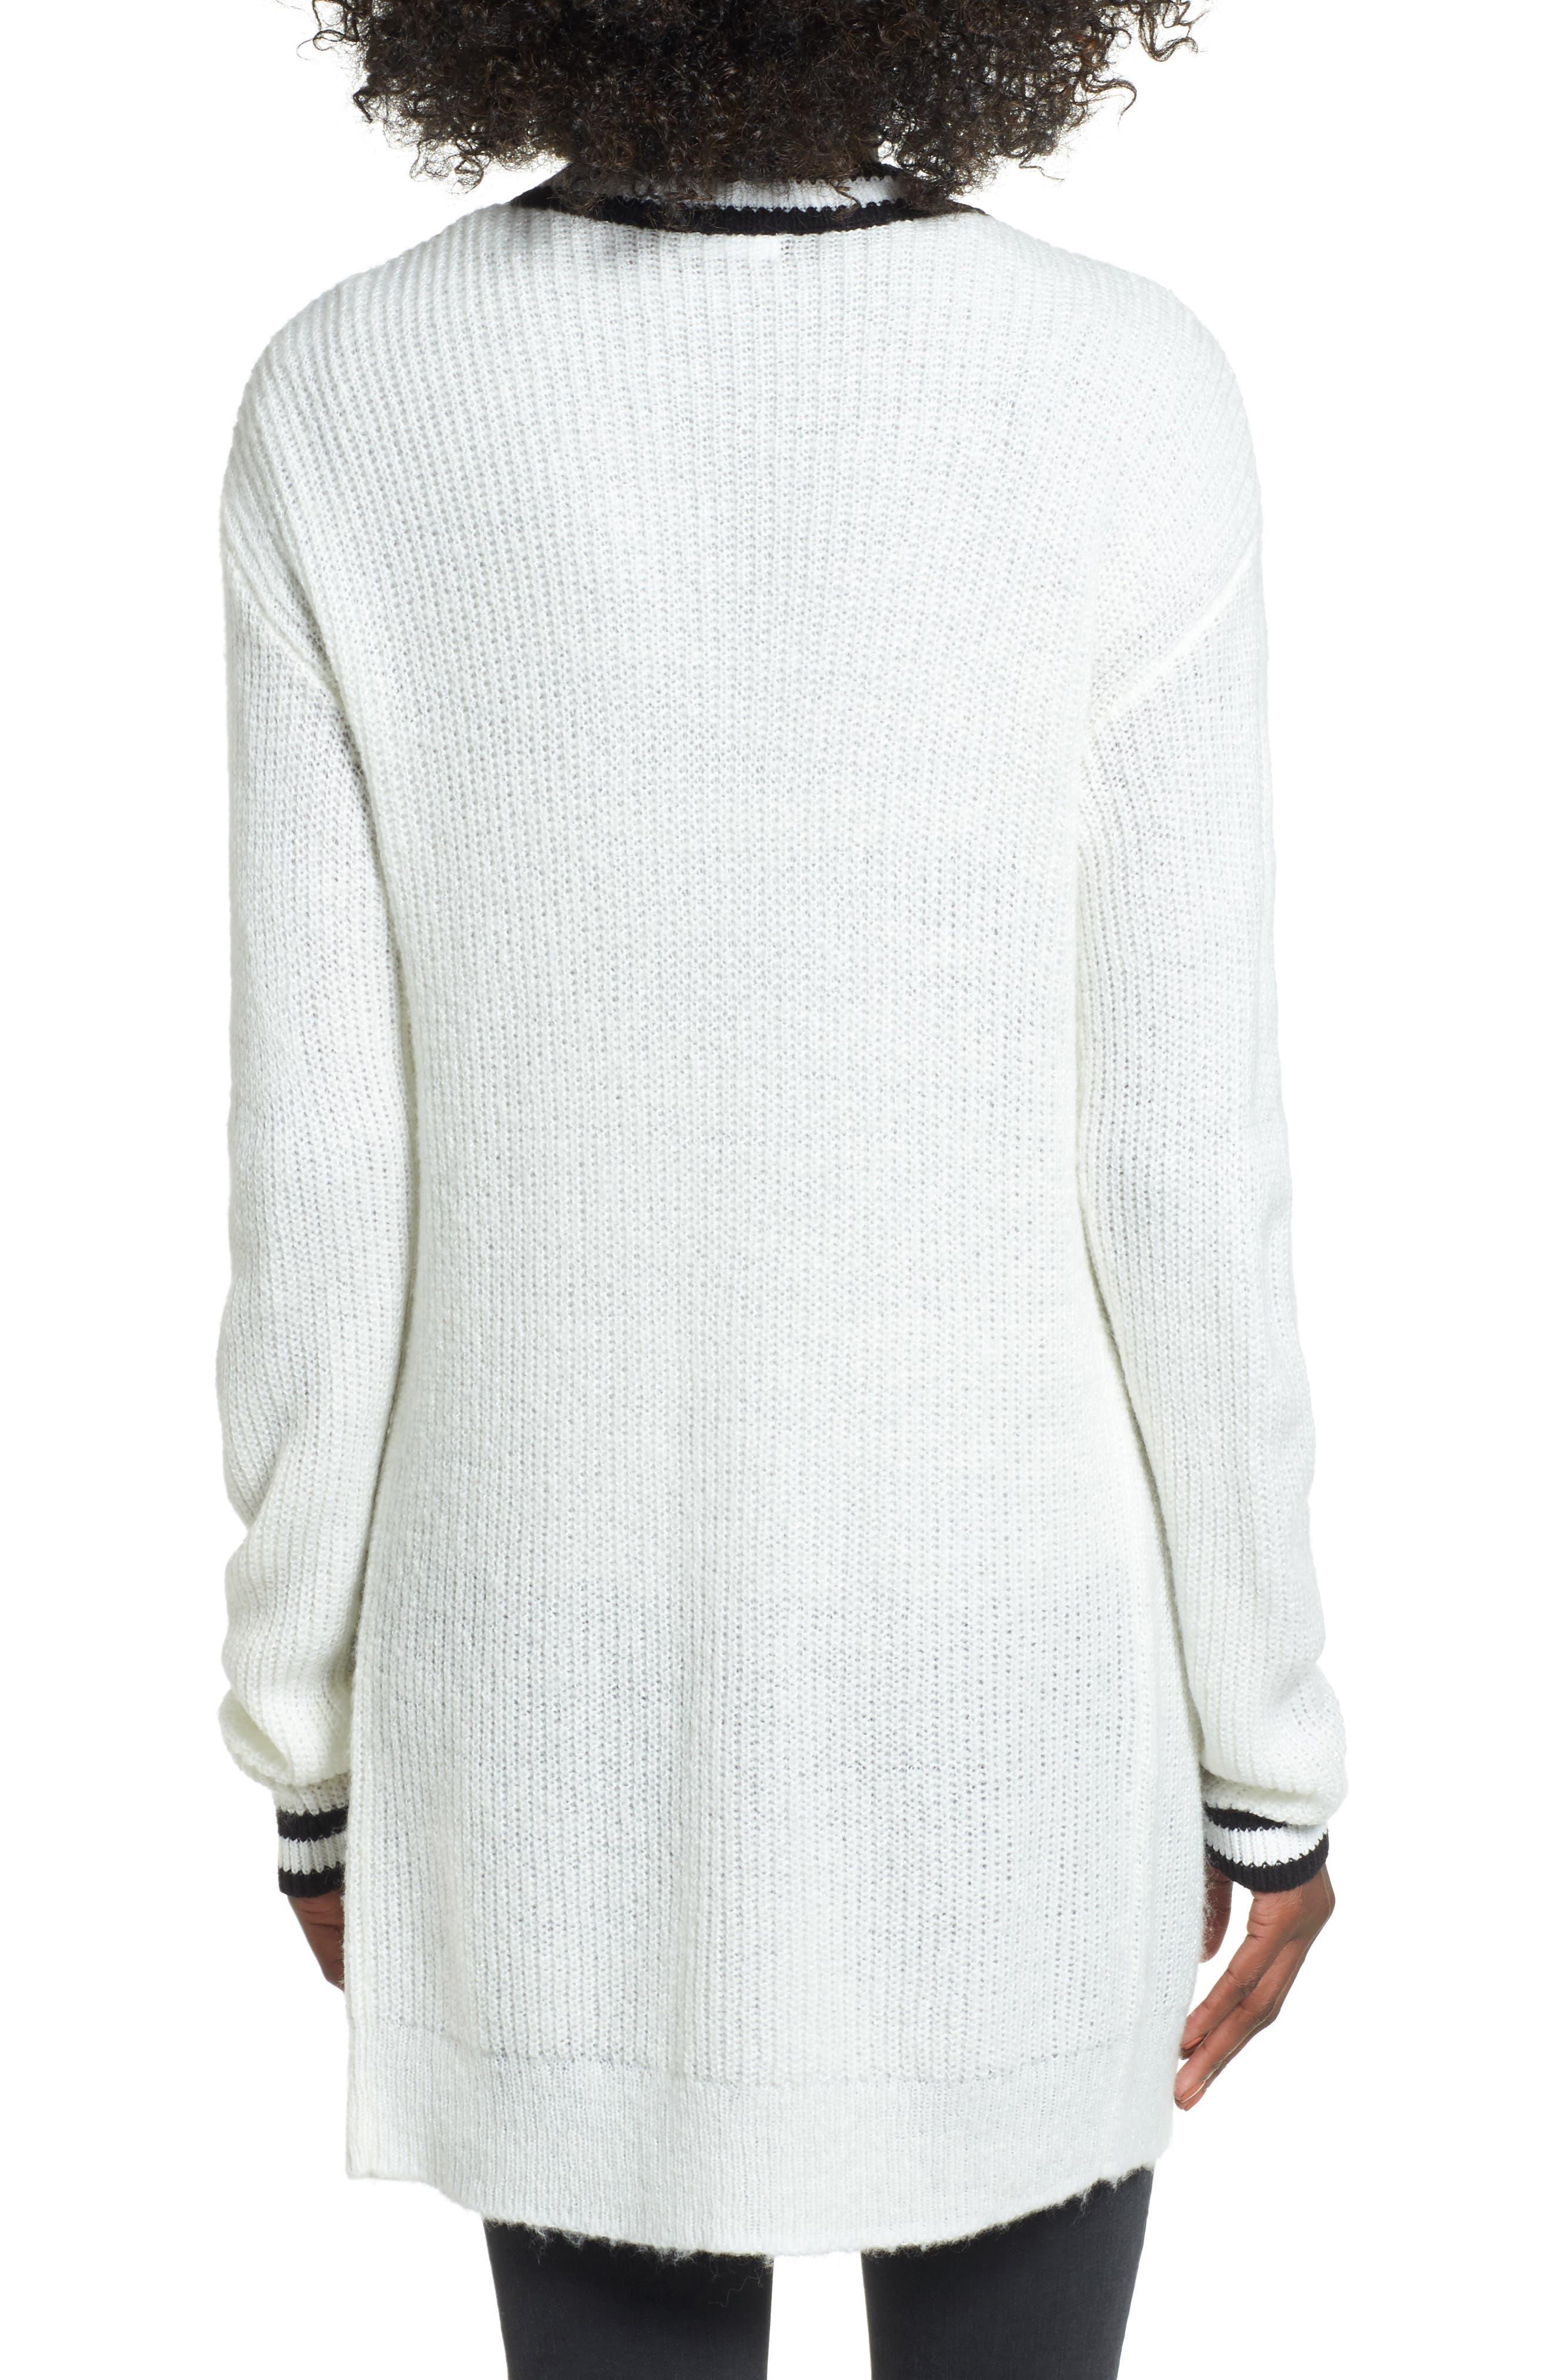 BP. Cardigan Sweaters & Sweatshirts, Cowl Necks, Cable Knits ...